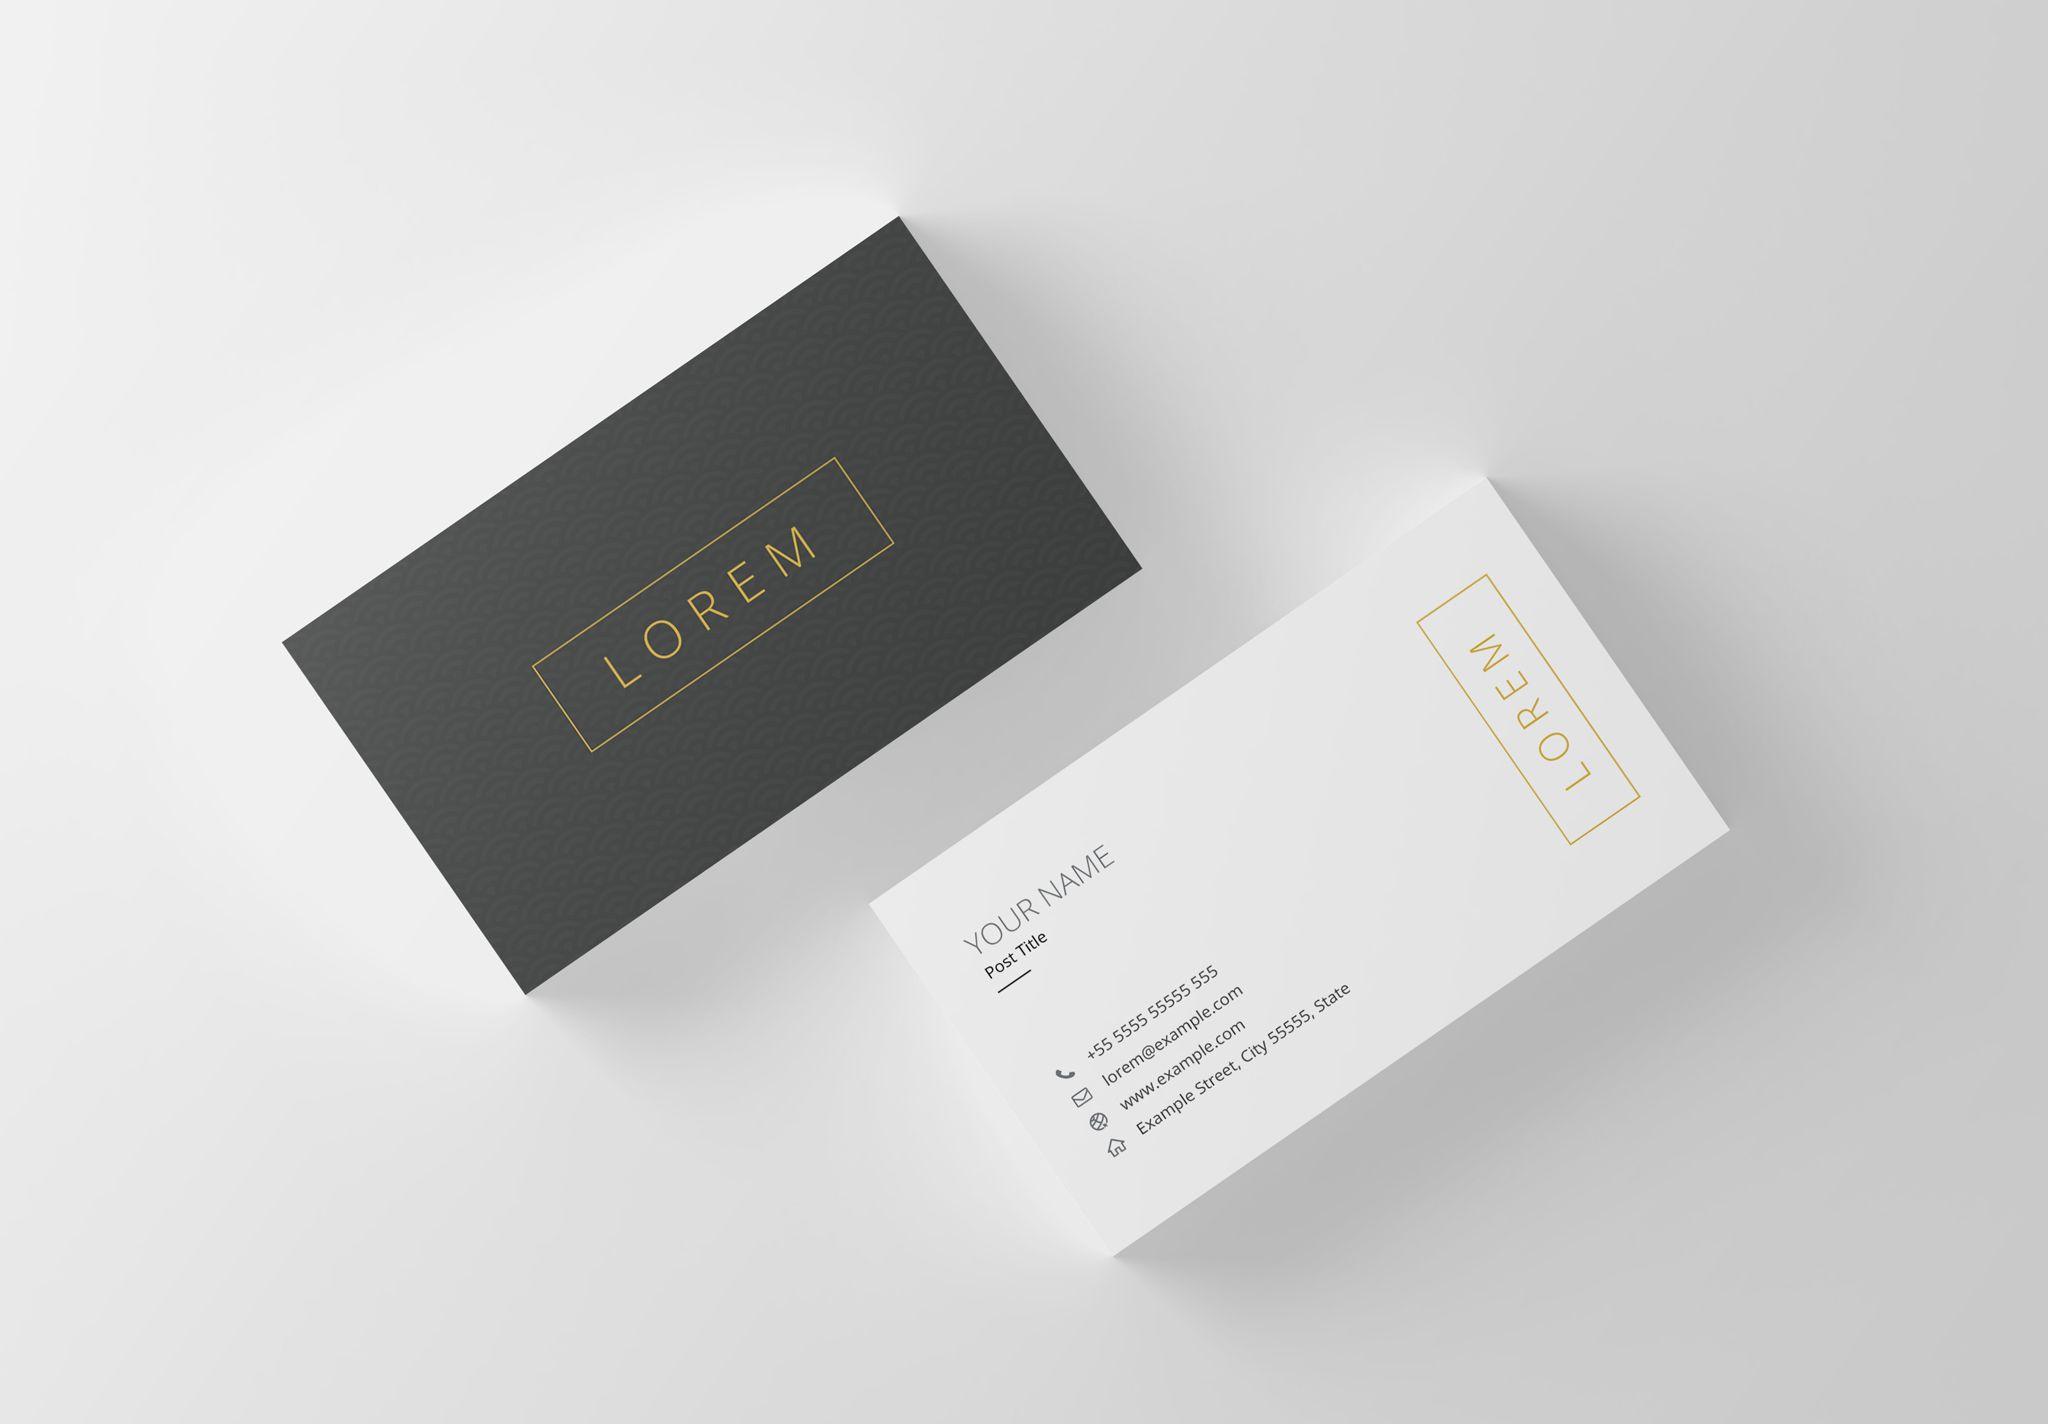 Professional Business Card Template 036 10 00 Crella Font